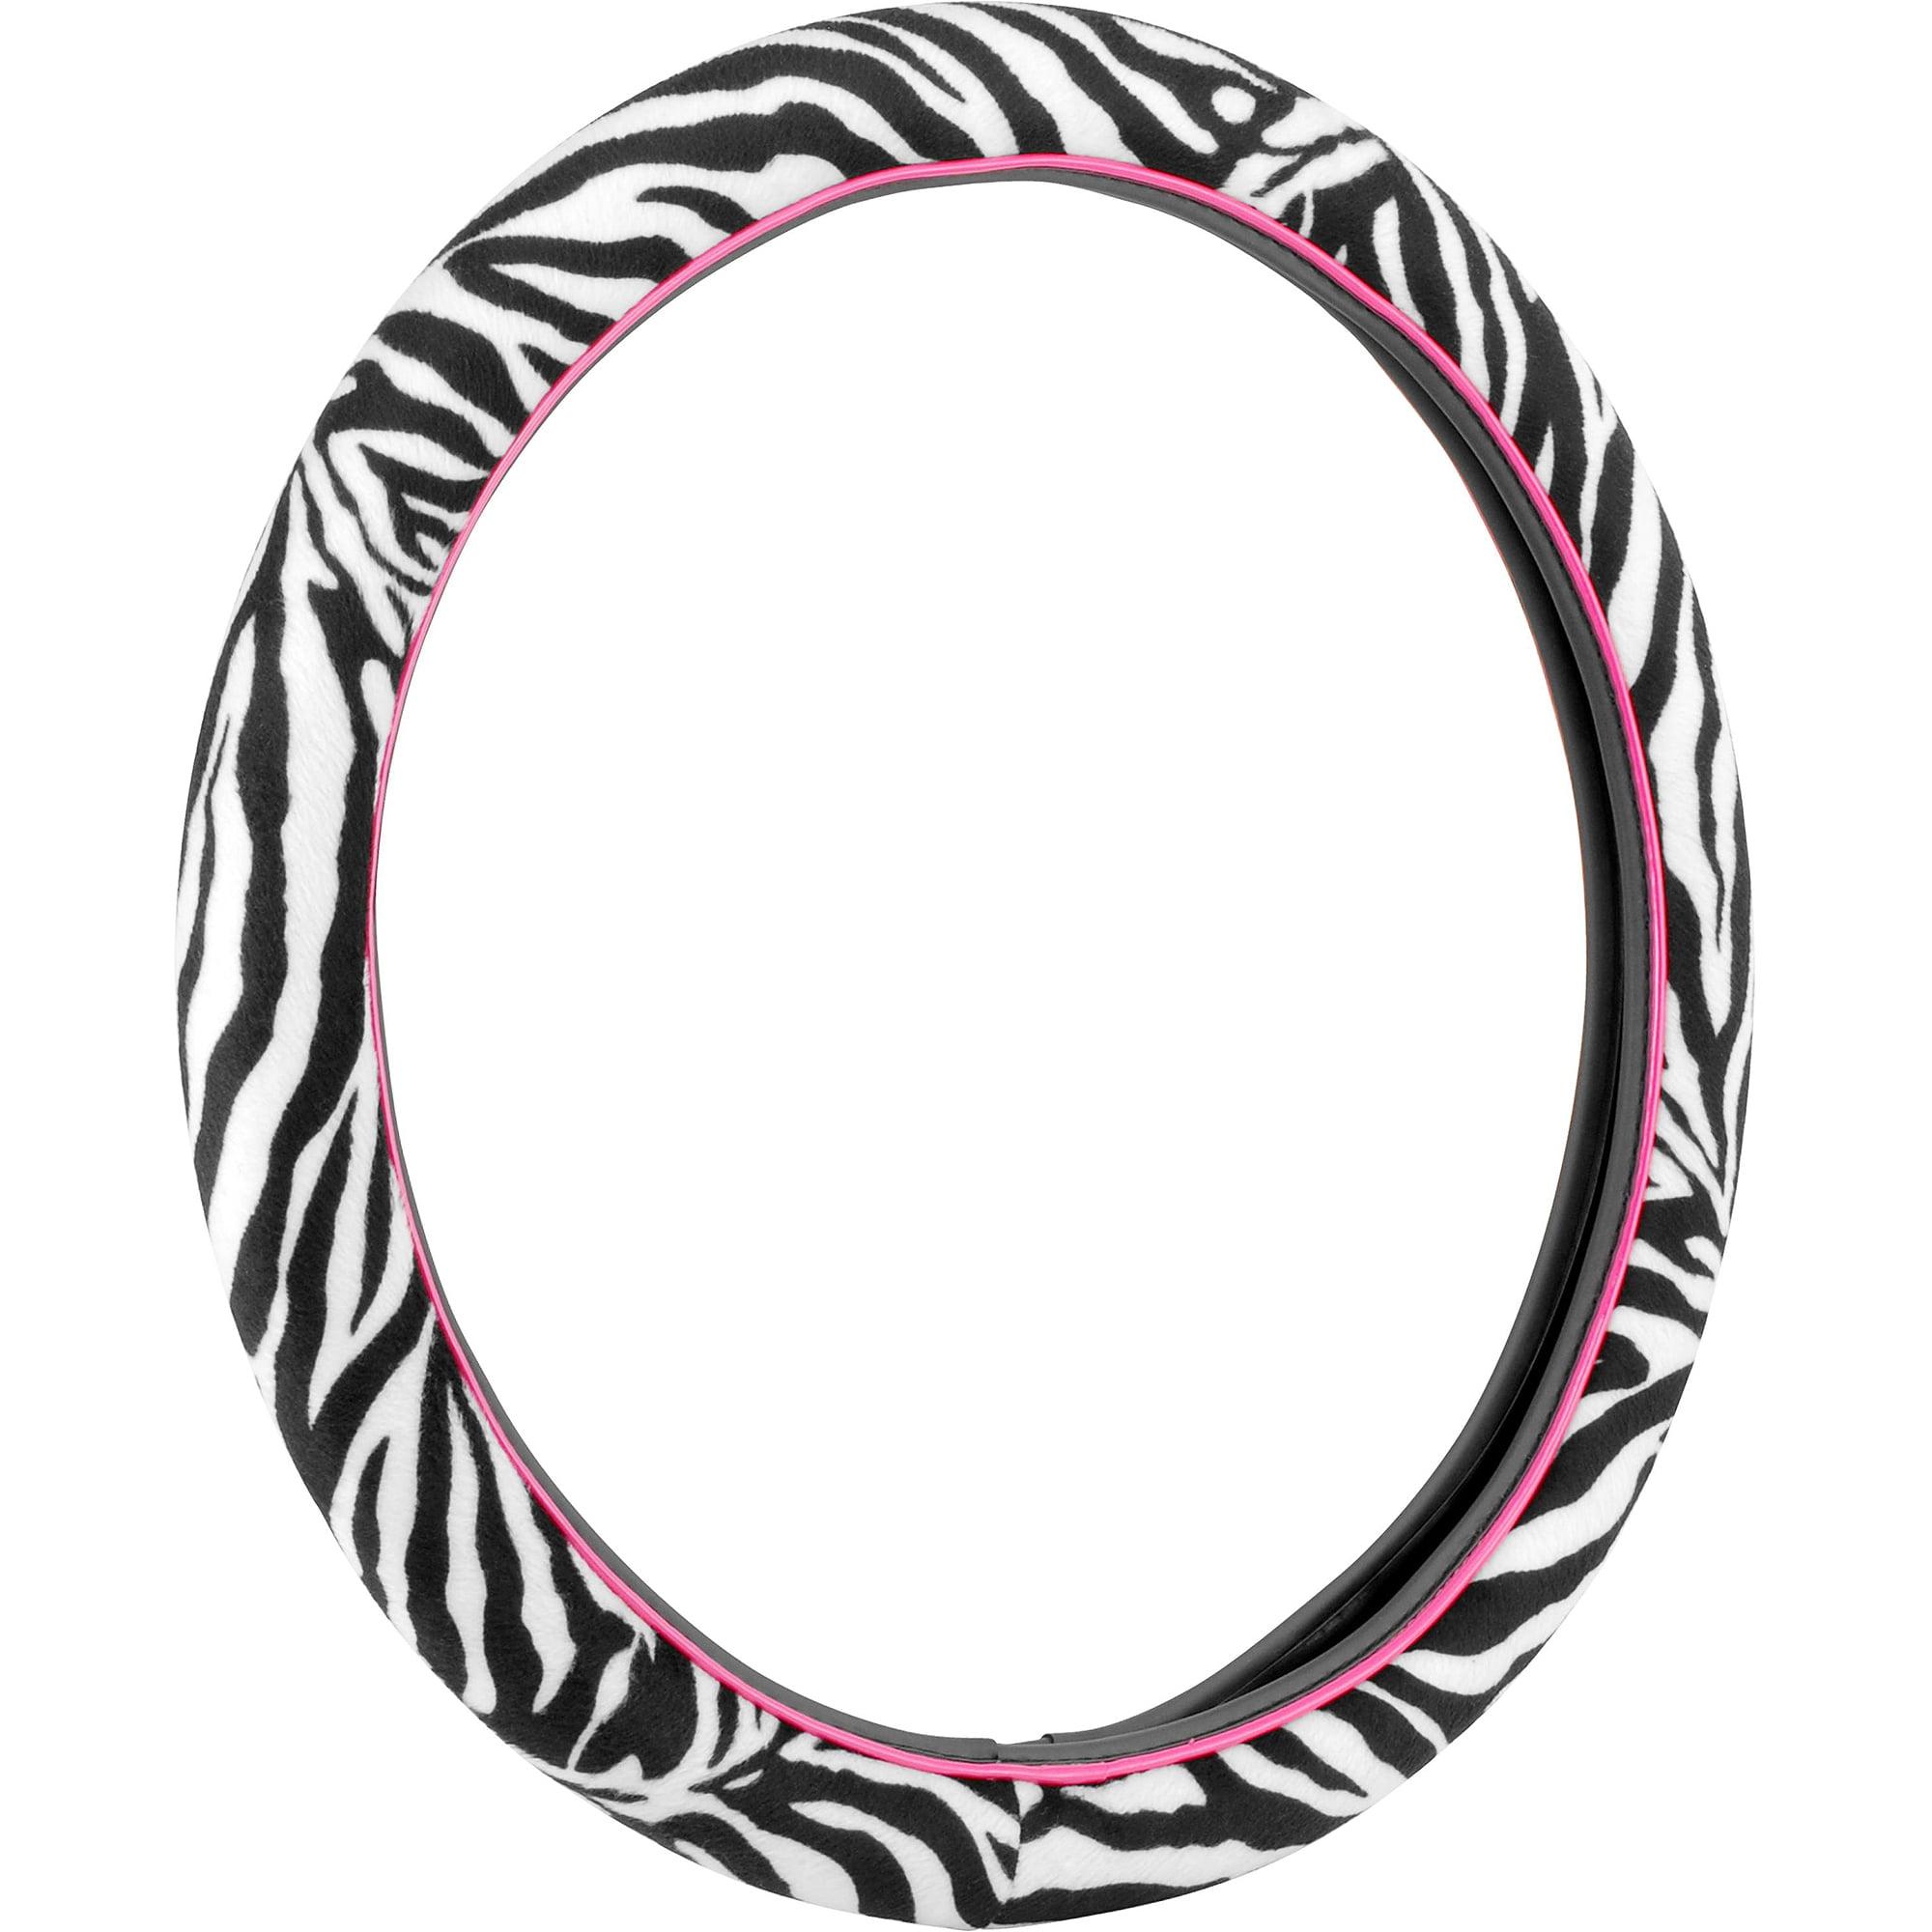 Auto Drive Steering Wheel Cover, Zebra/Pink